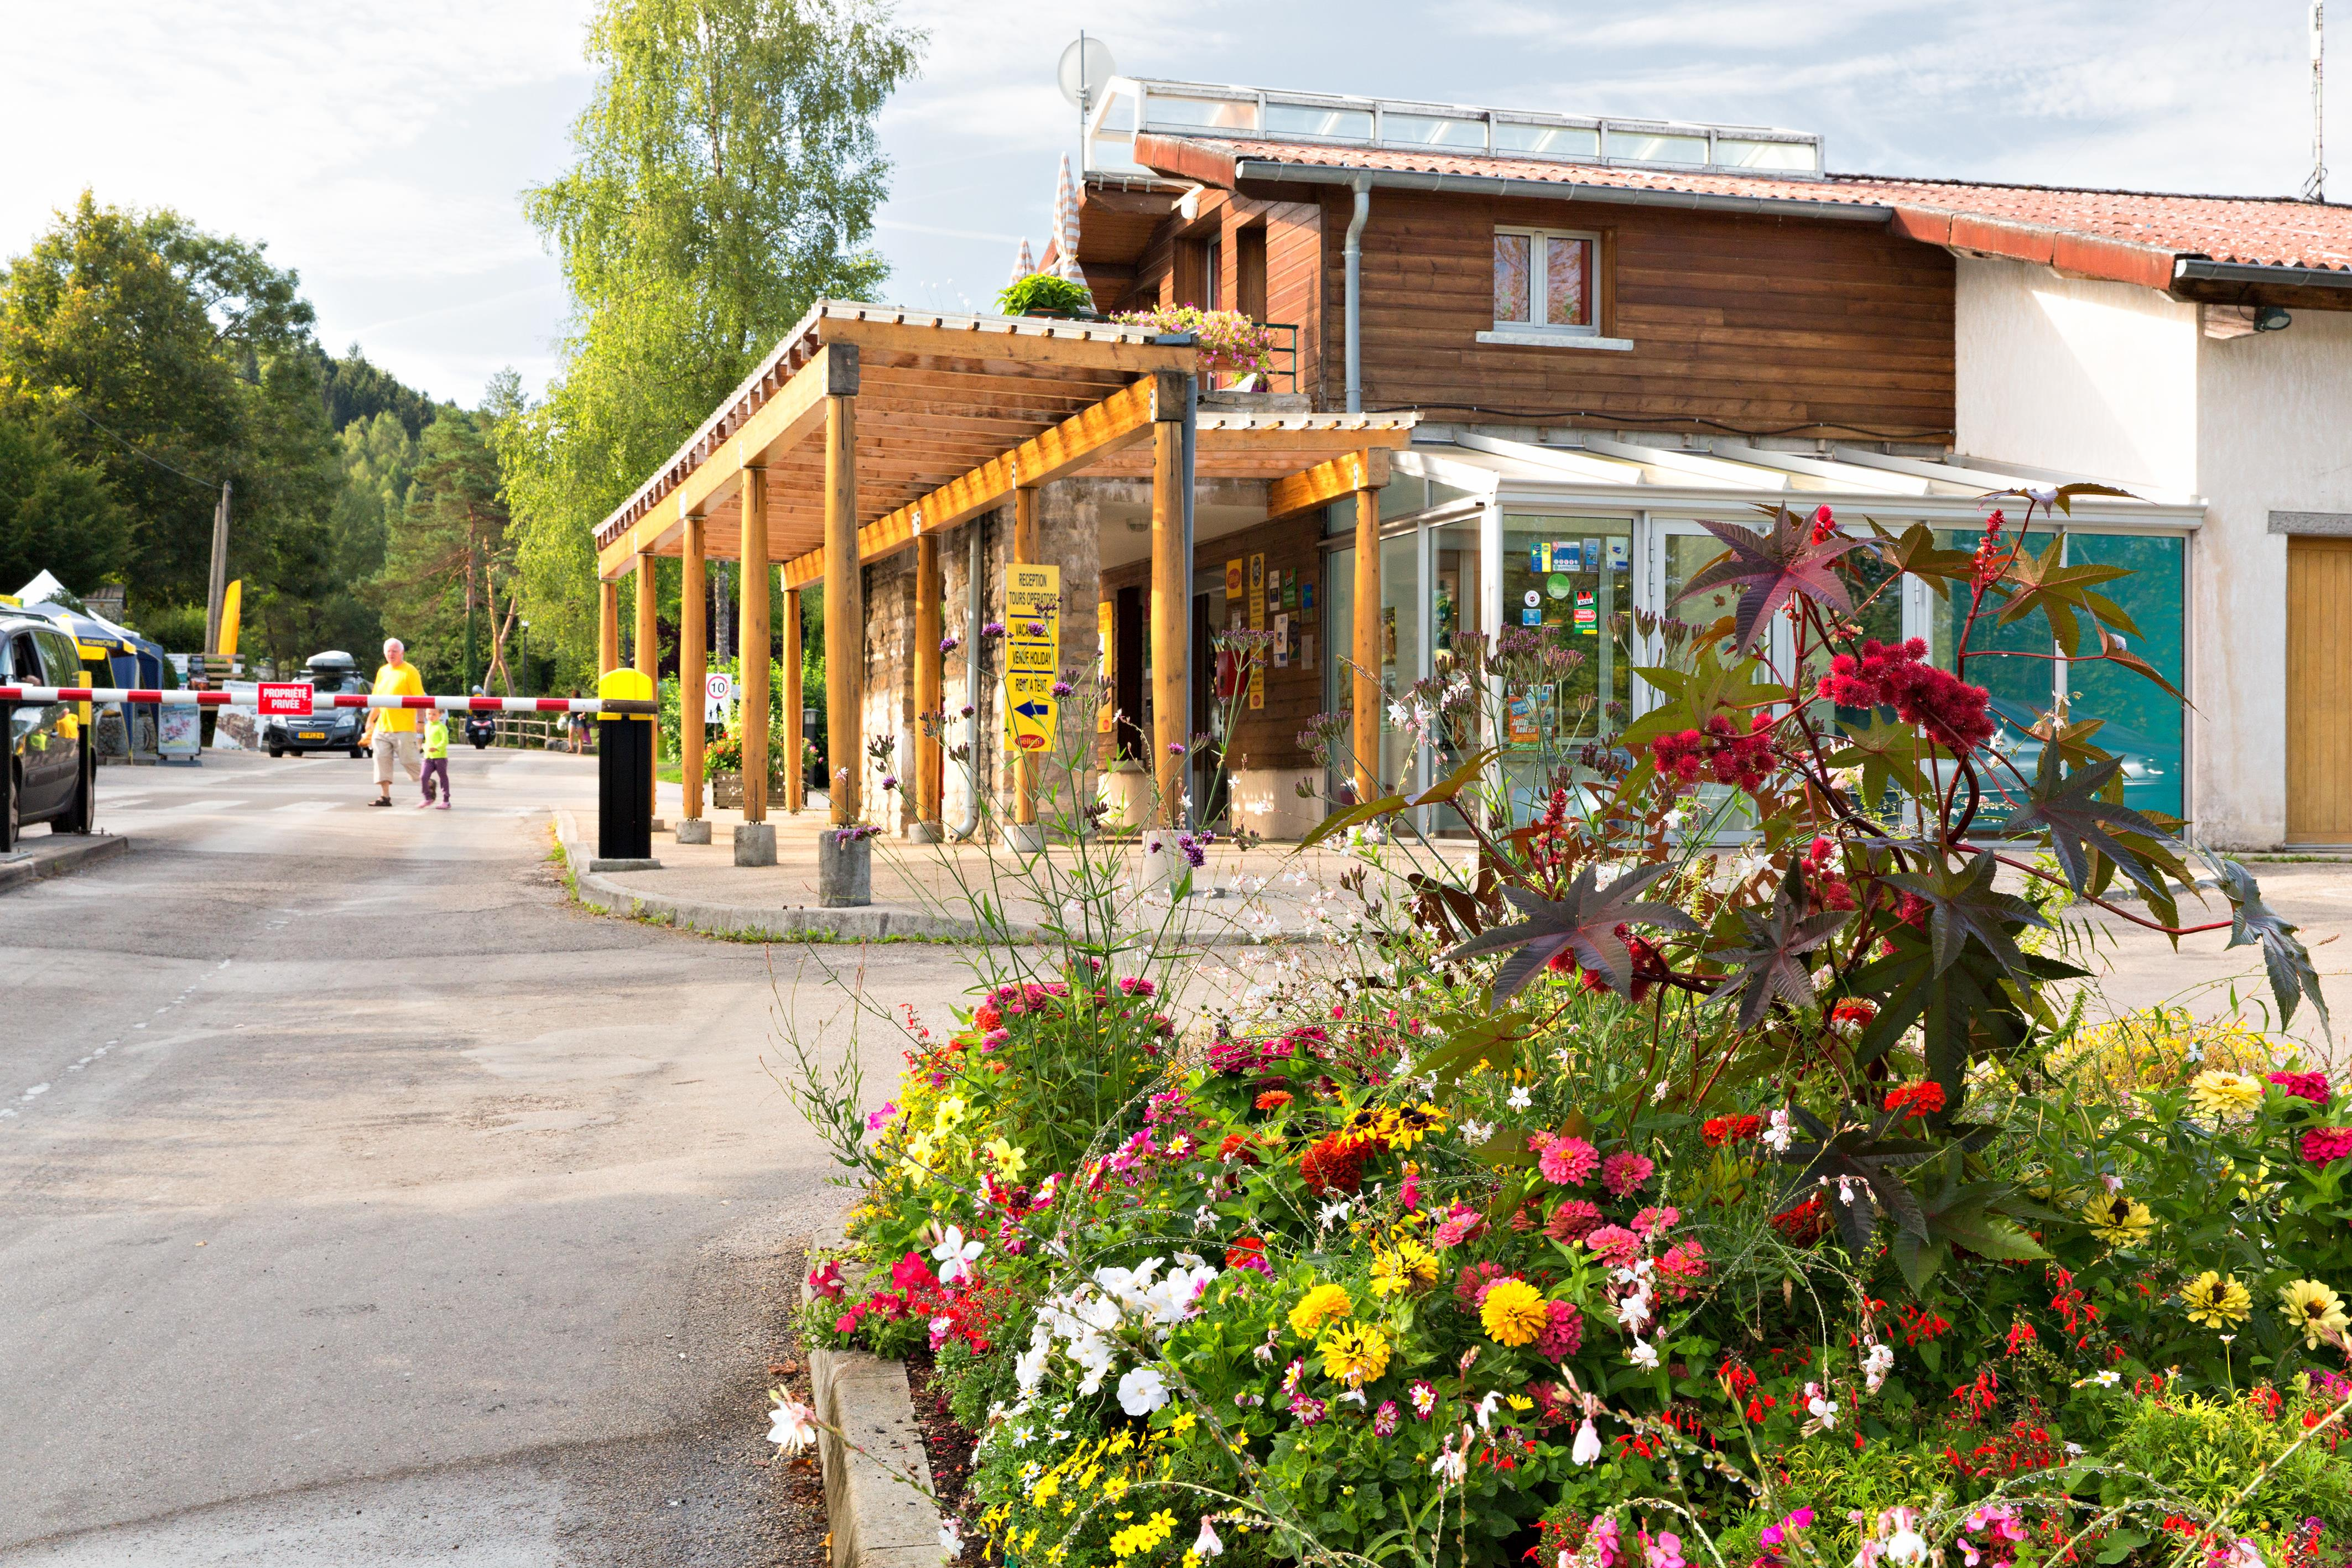 Camping Fayolan, Clairvaux-les-Lacs, Jura